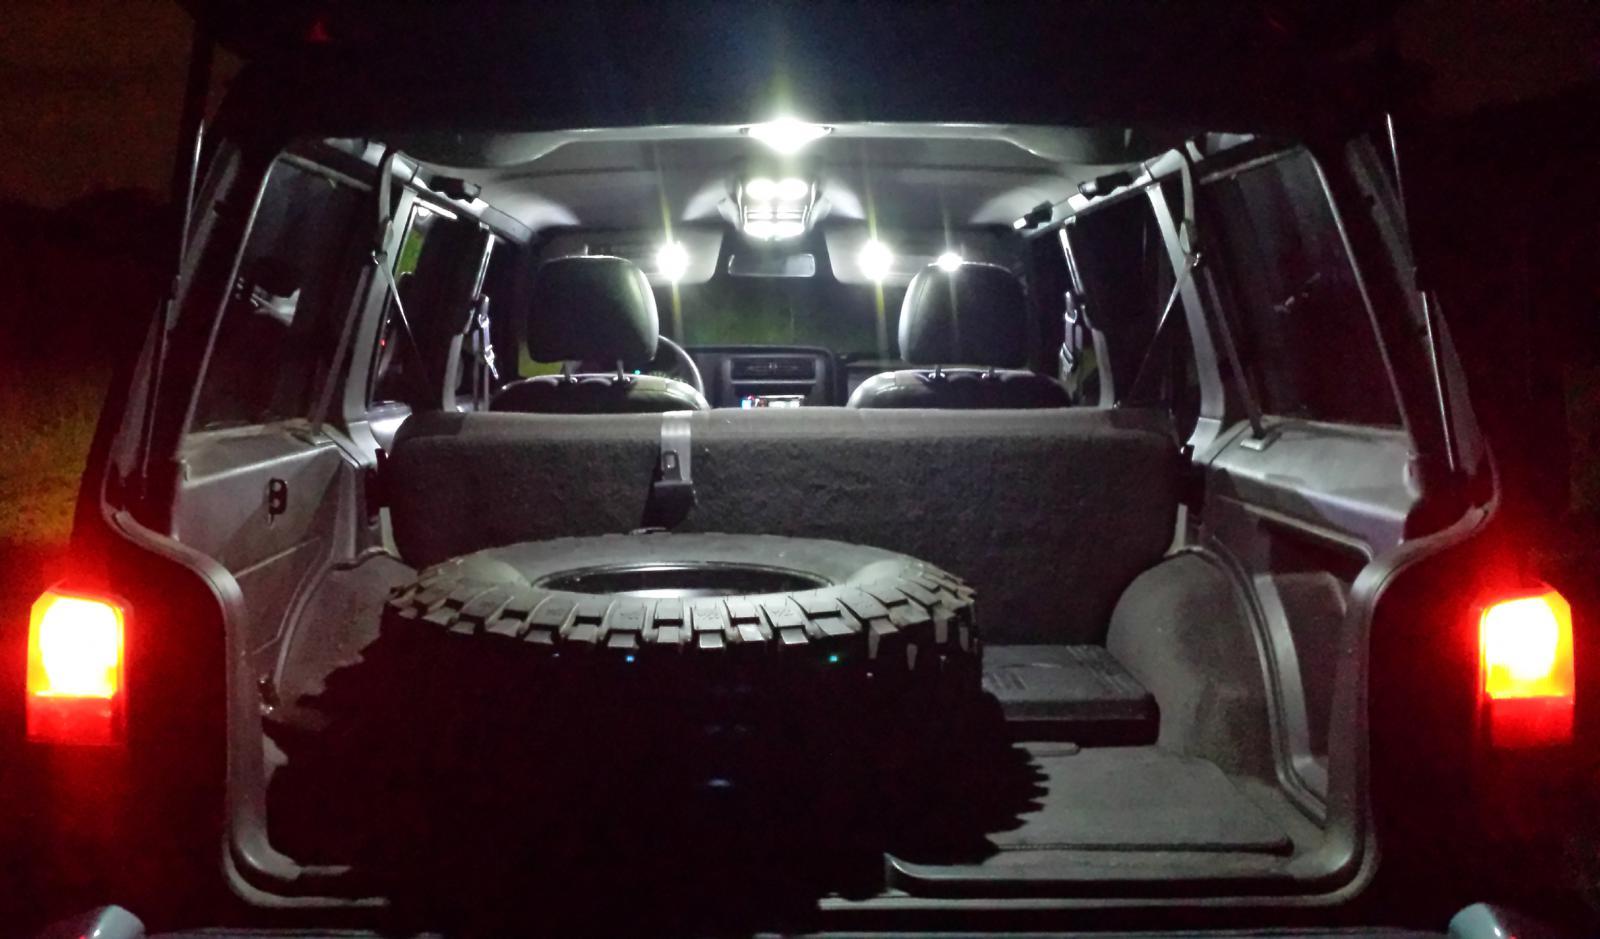 1997 2001 Jeep Cherokee Xj Interior Led Light Set White W Overhead Console Ebay